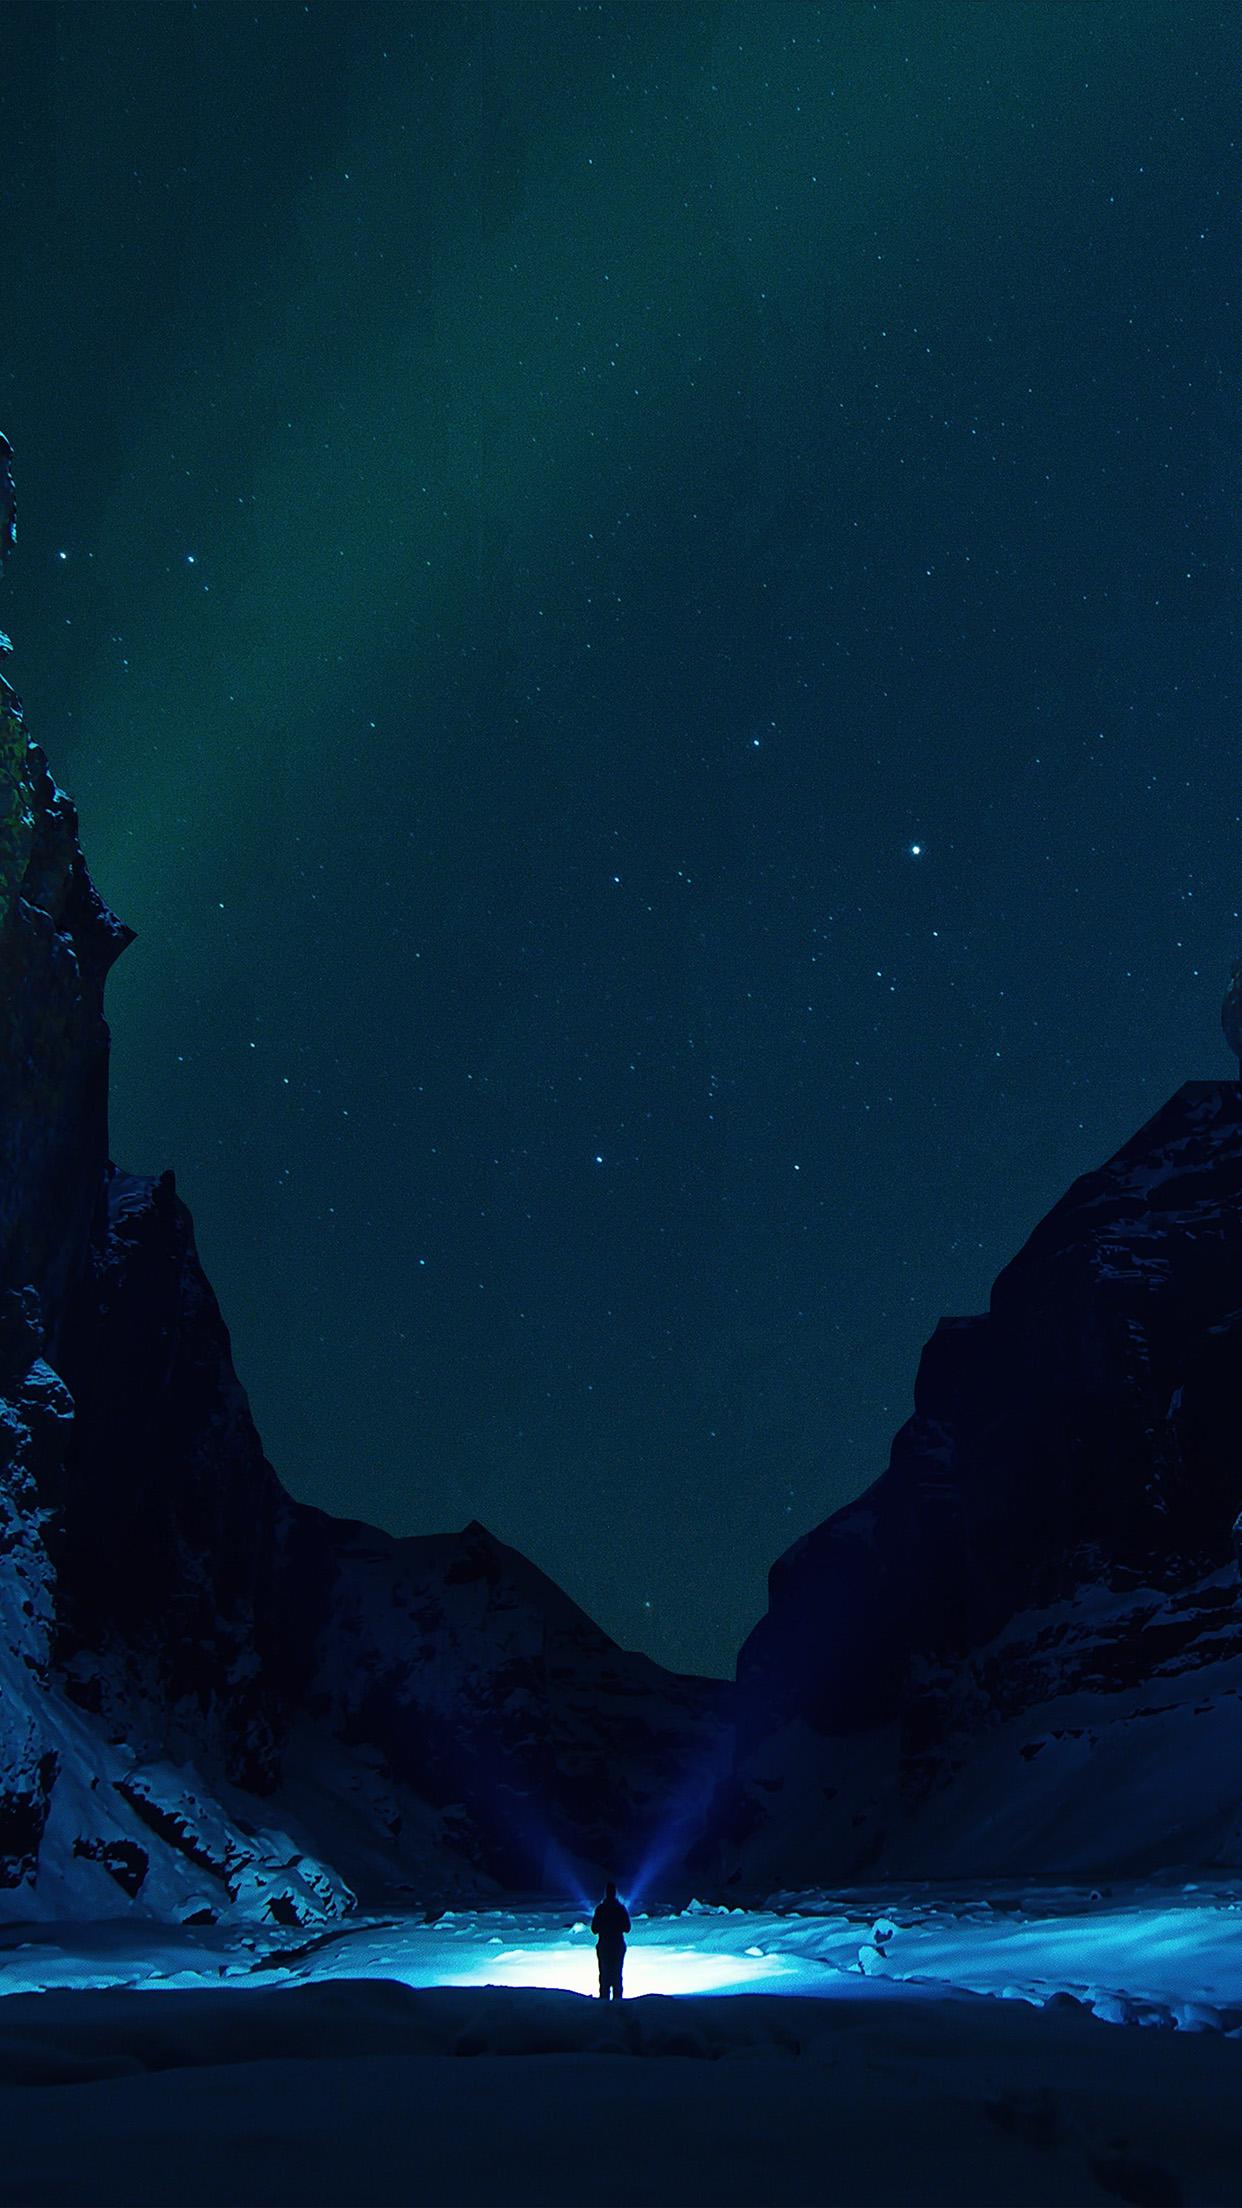 Cute Bokeh Wallpaper Nv33 Winter Dark Night Mountain Nature Wallpaper